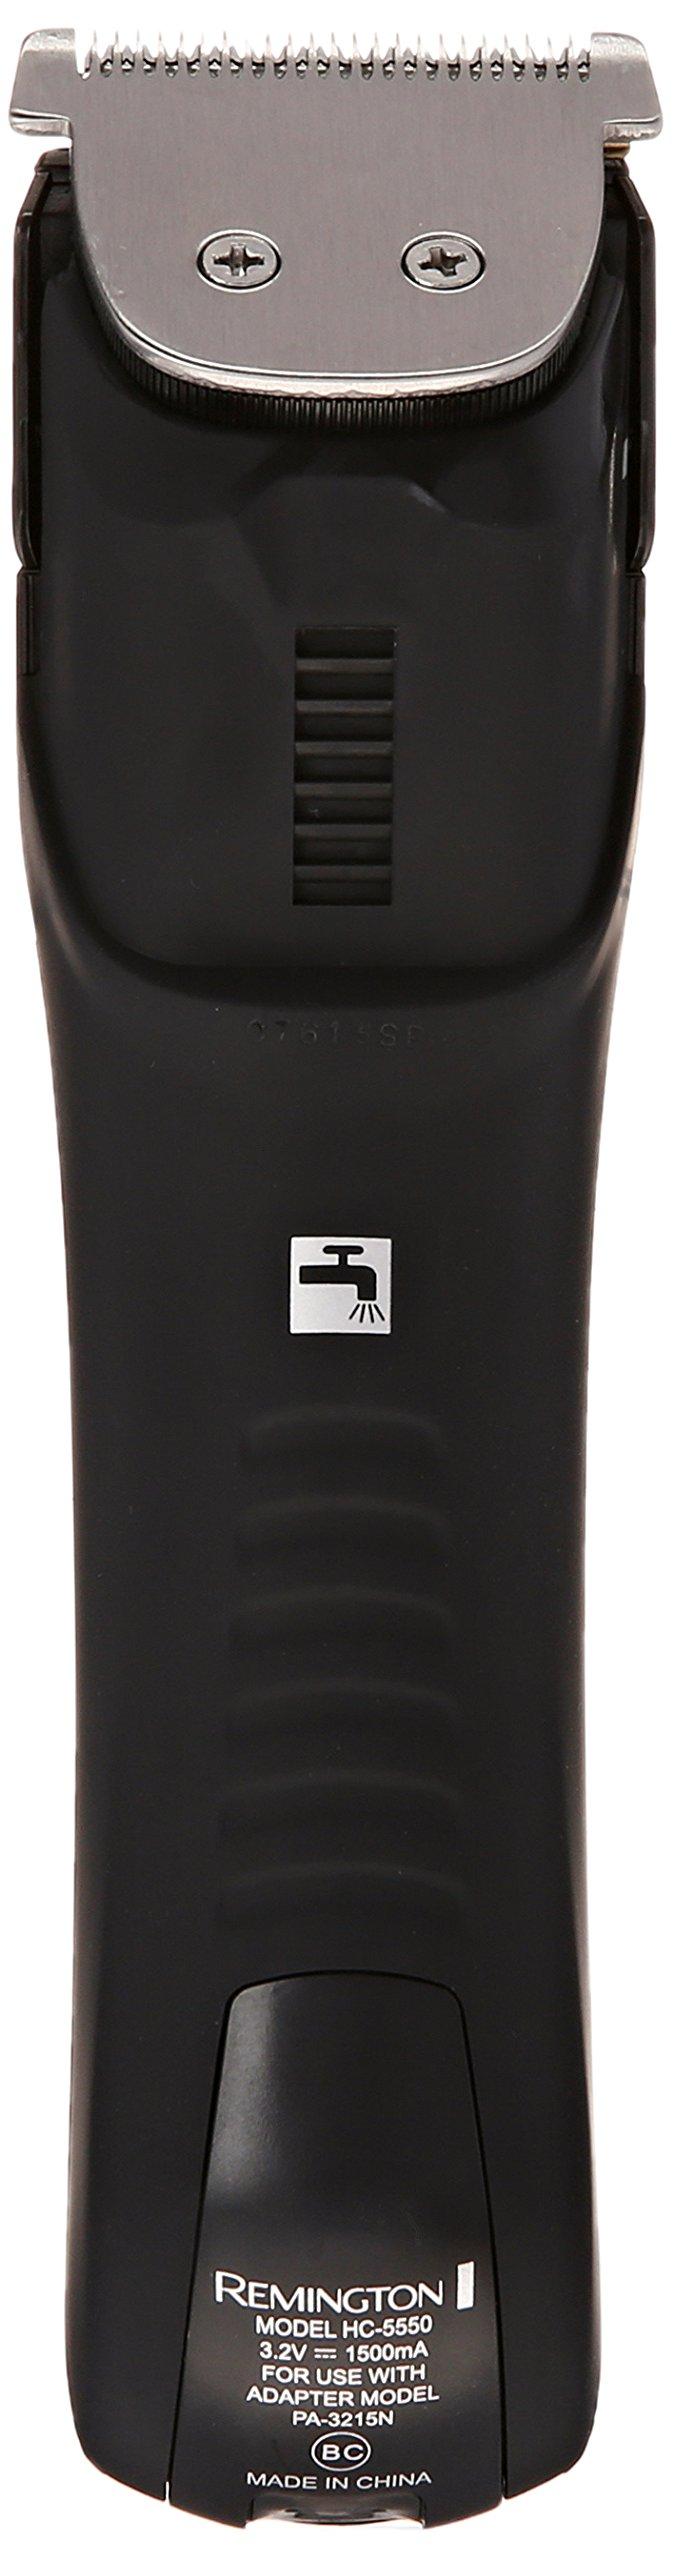 Remington HC5550AM Precision Power Haircut & Beard Trimmer, Hair Clippers, Beard Trimmer, Clippers by Remington (Image #2)